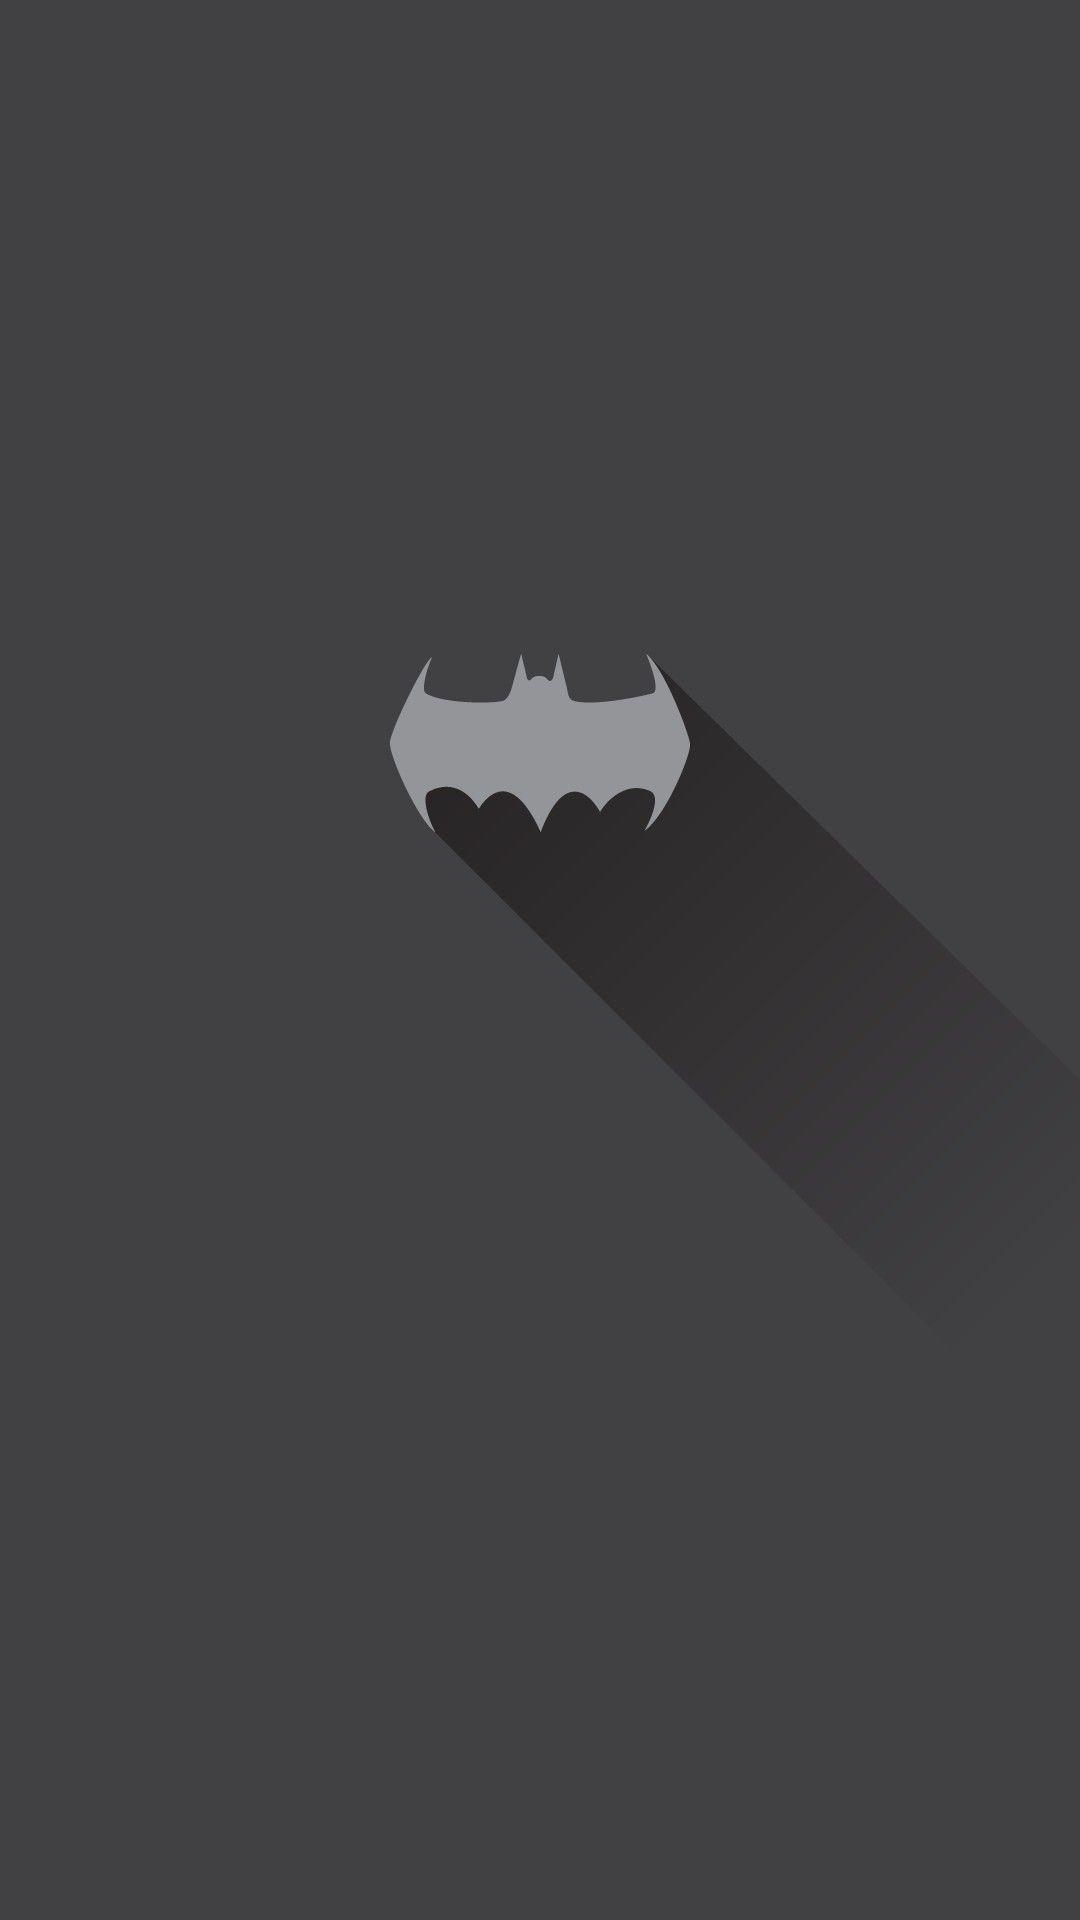 Batman Arkham Knight Scarecrow Wallpaper Android In 2020 Grey Wallpaper Android Batman Wallpaper Android Wallpaper Batman